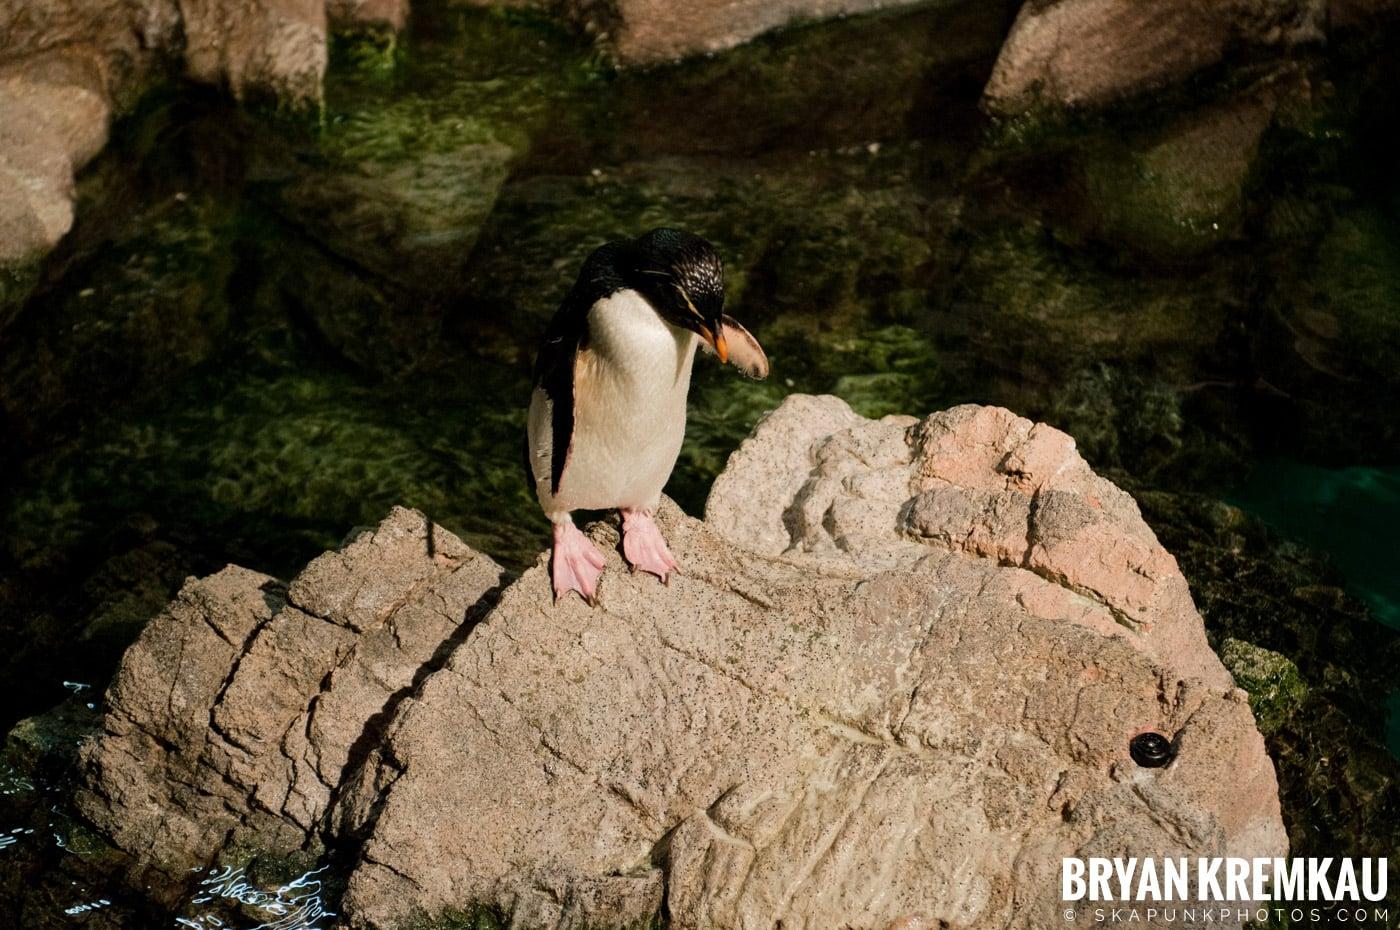 New England Aquarium @ Boston, MA - 6.2.12 (6)